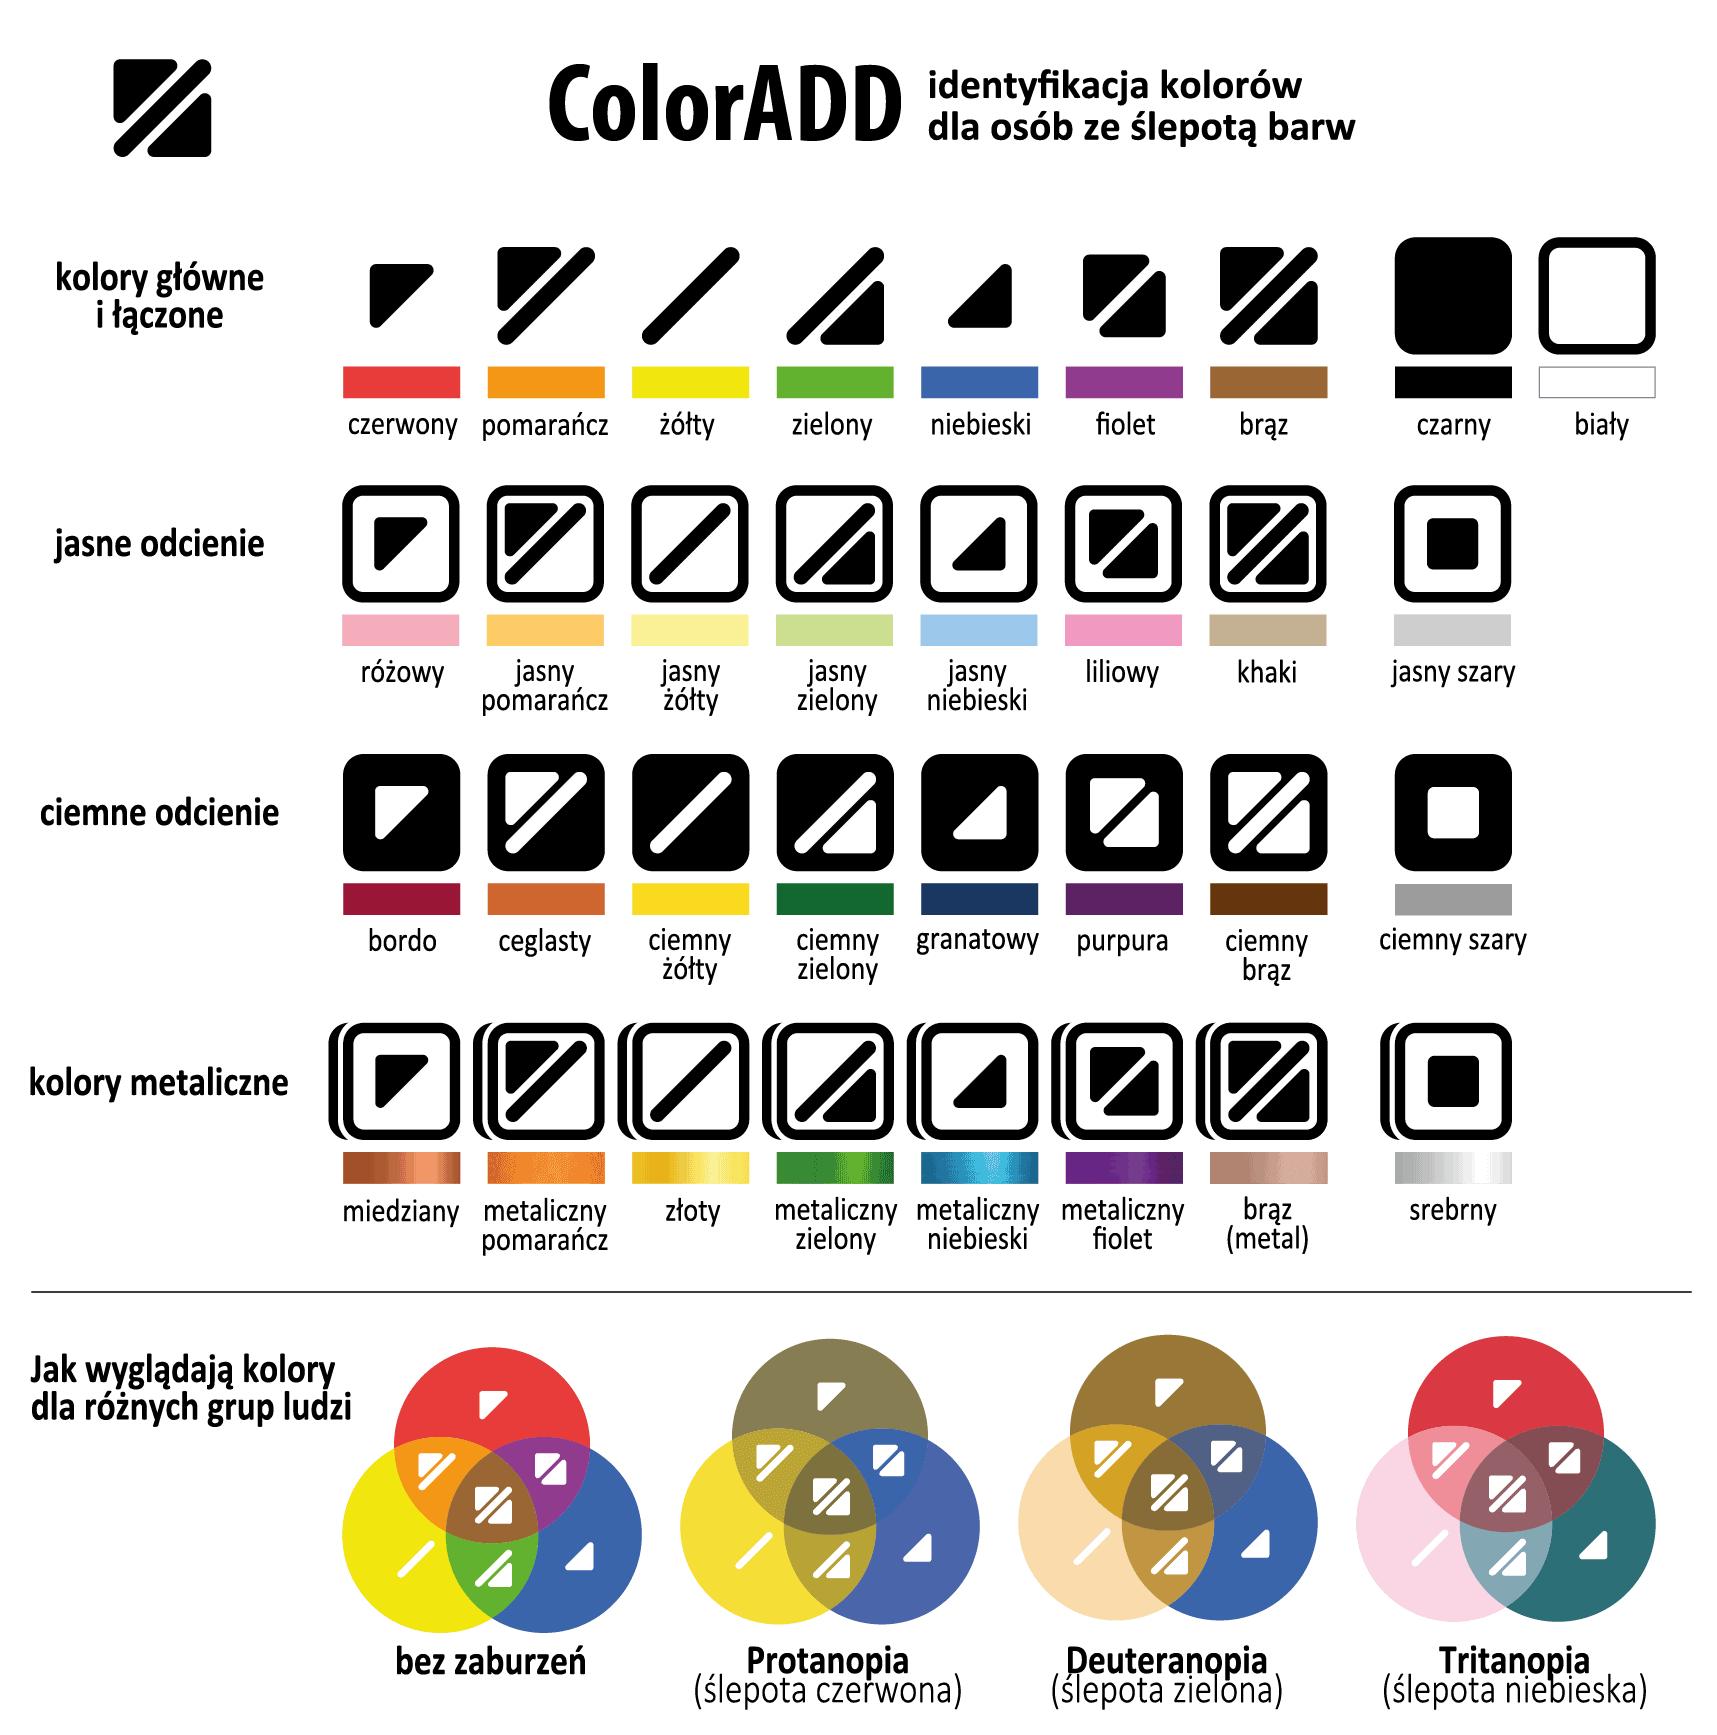 ColorADD, system dla osób ze ślepotą kolorów